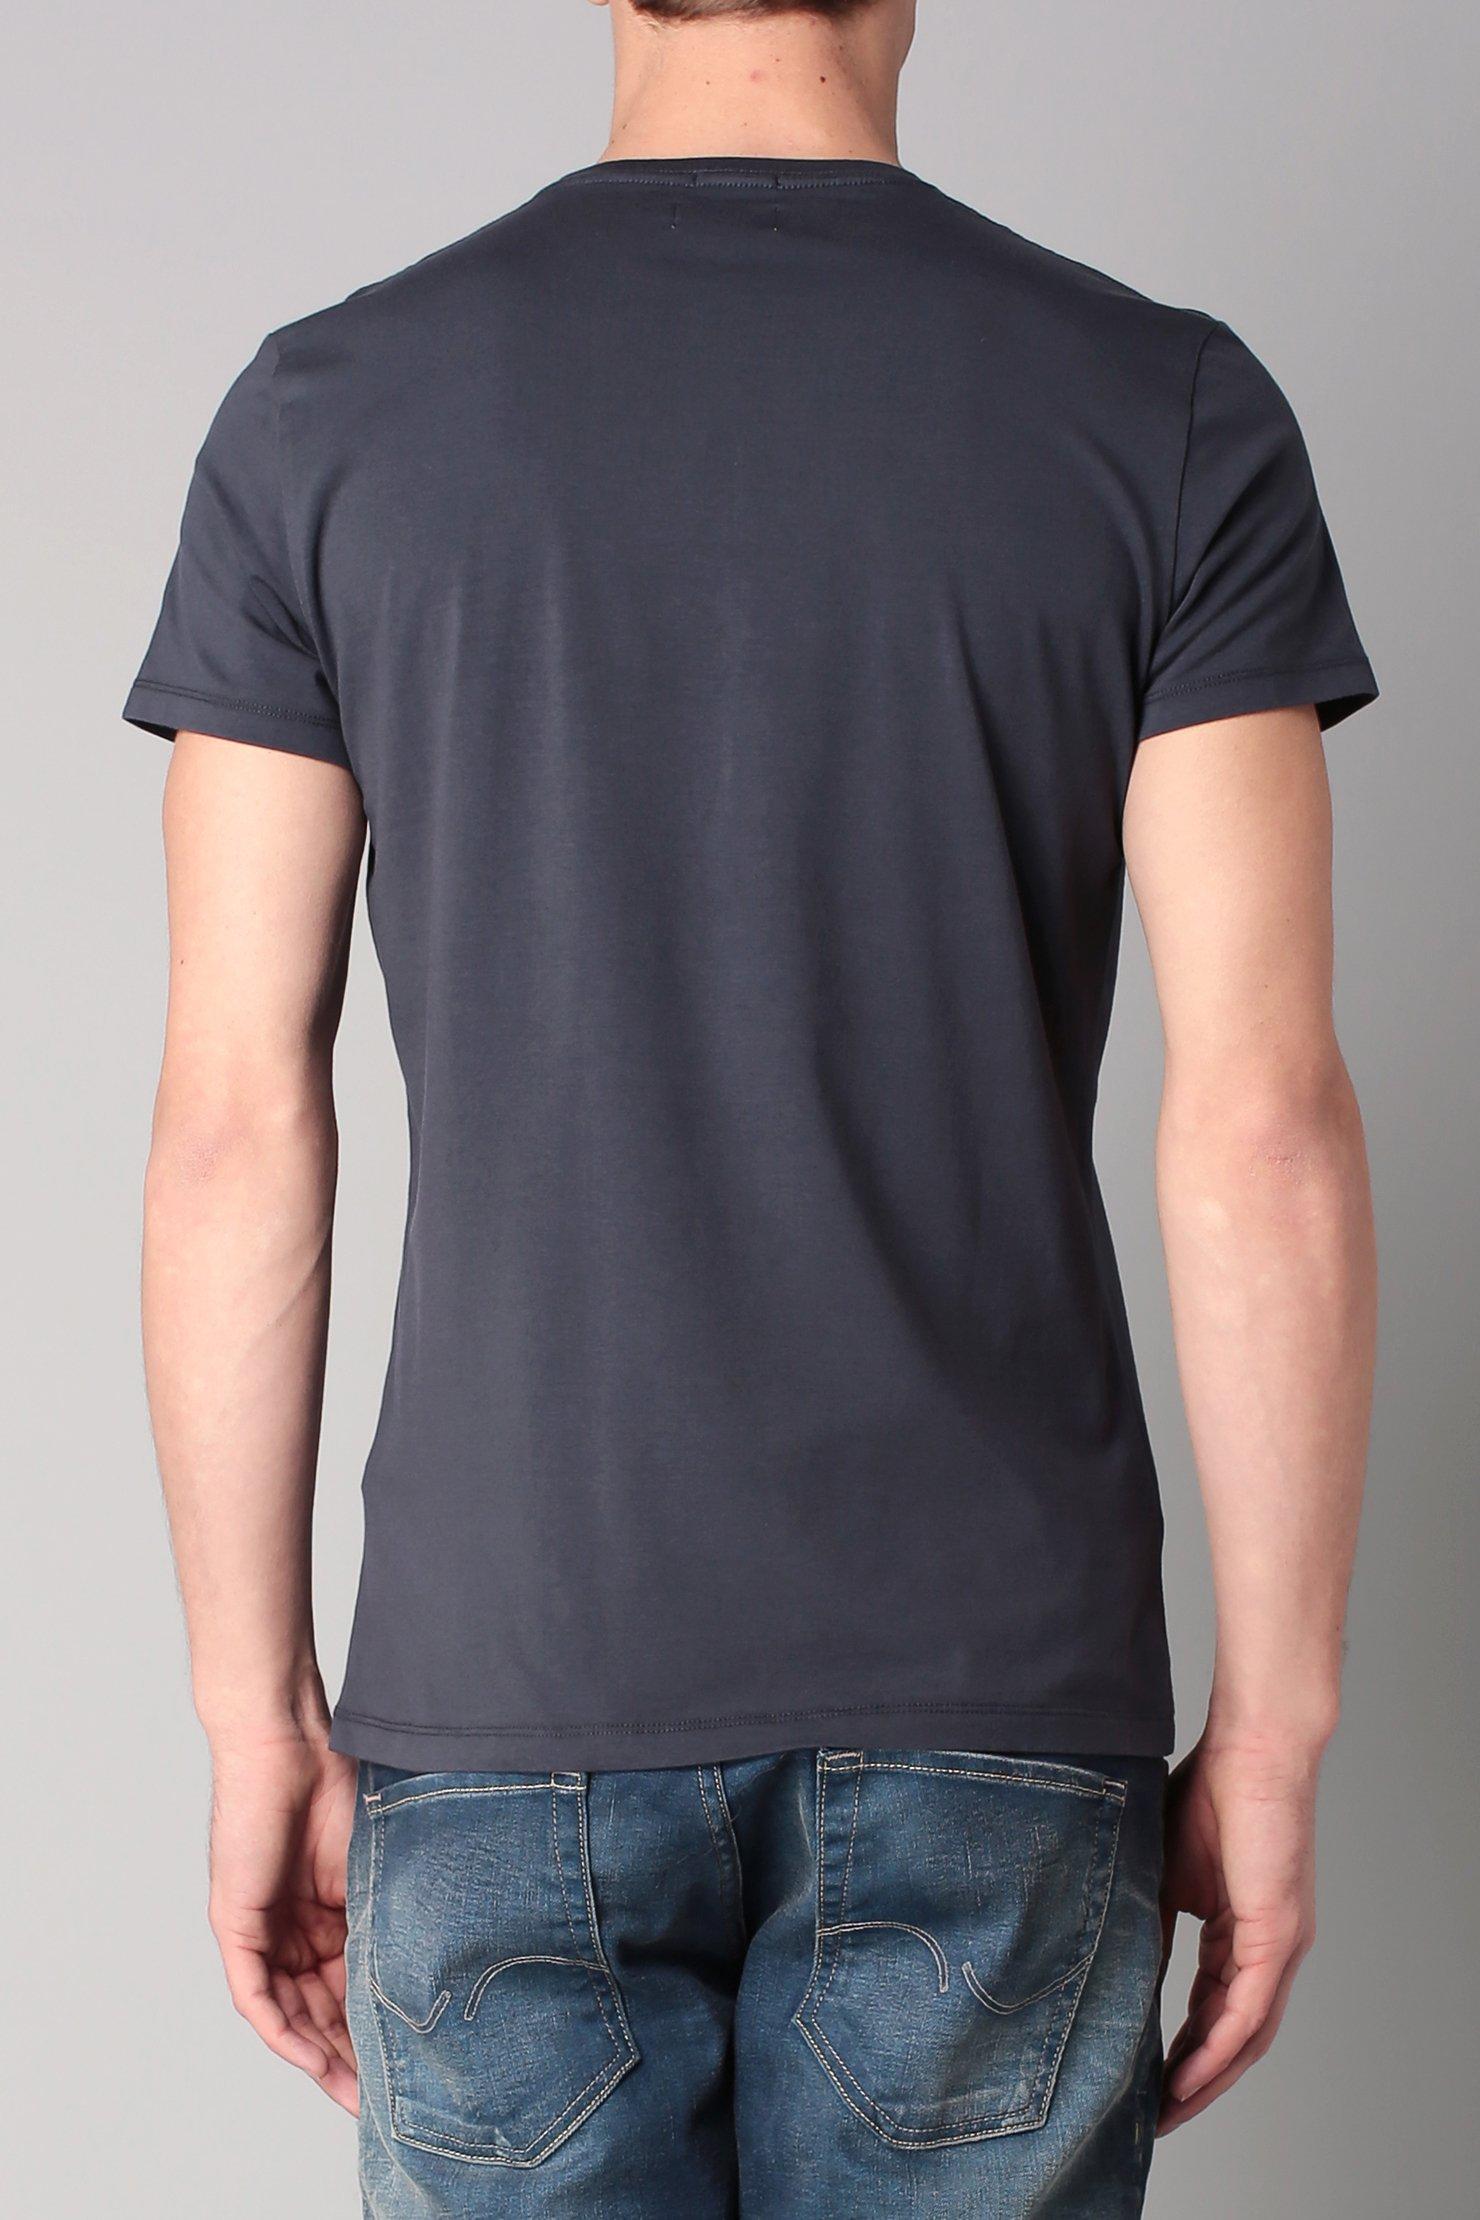 pepe jeans short sleeve t shirt in gray for men lyst. Black Bedroom Furniture Sets. Home Design Ideas